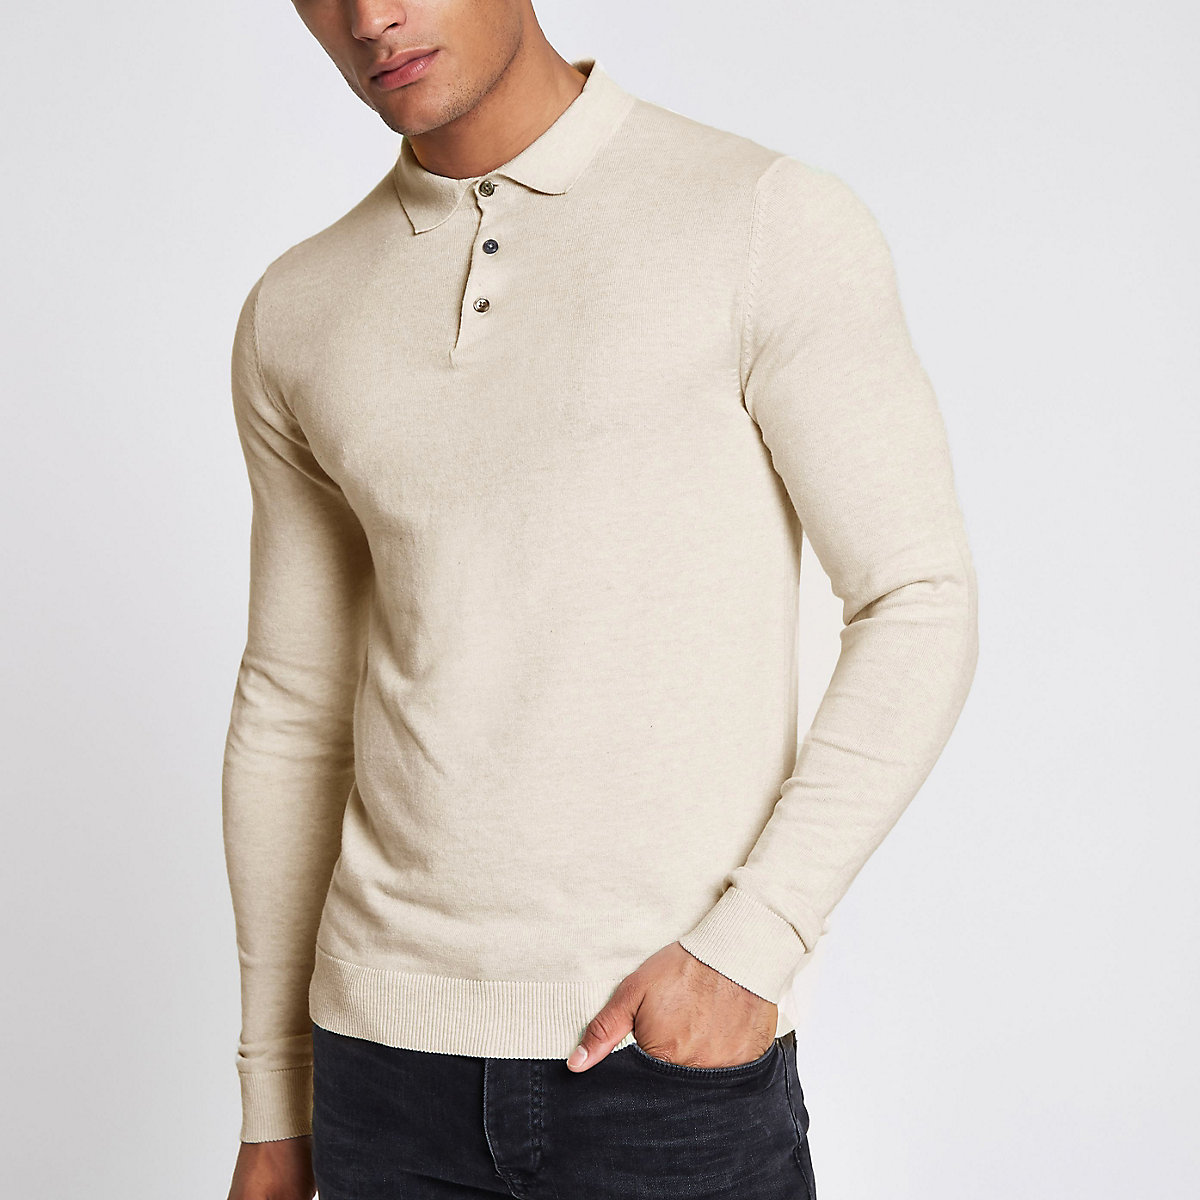 Jack & Jones Premium beige knitted polo shirt